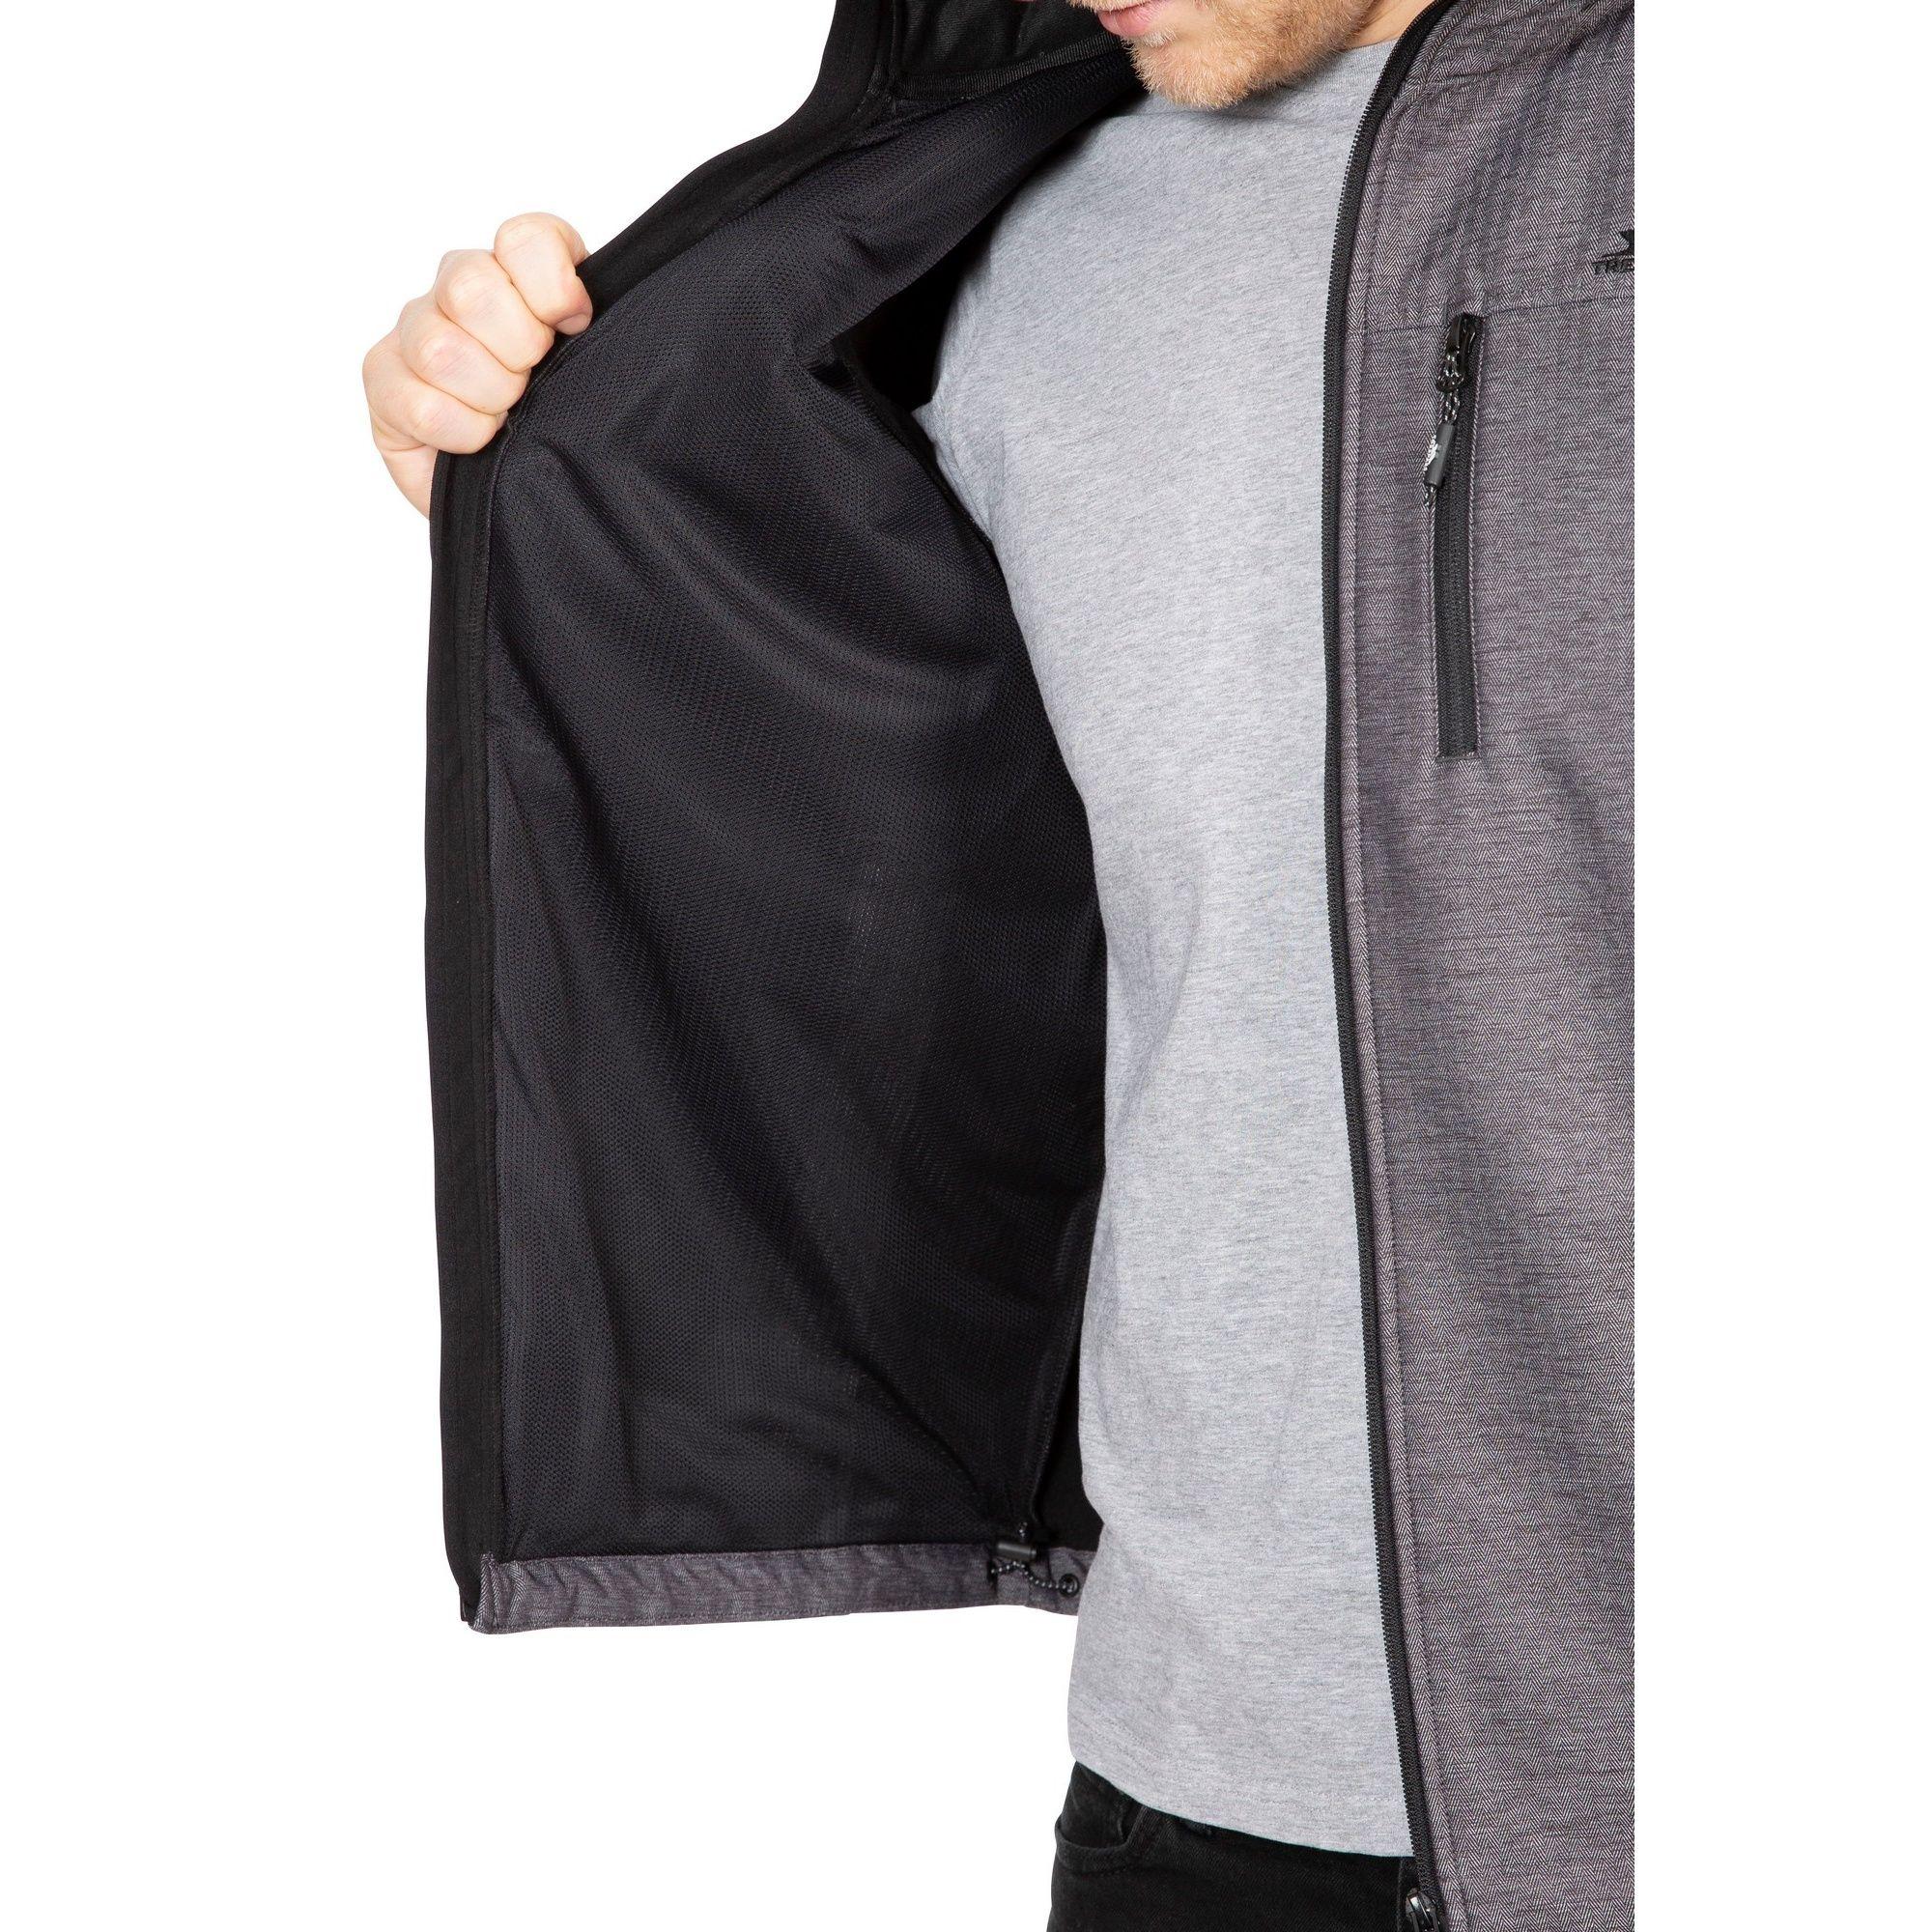 Trespass Mens Carter Waterproof Softshell Jacket